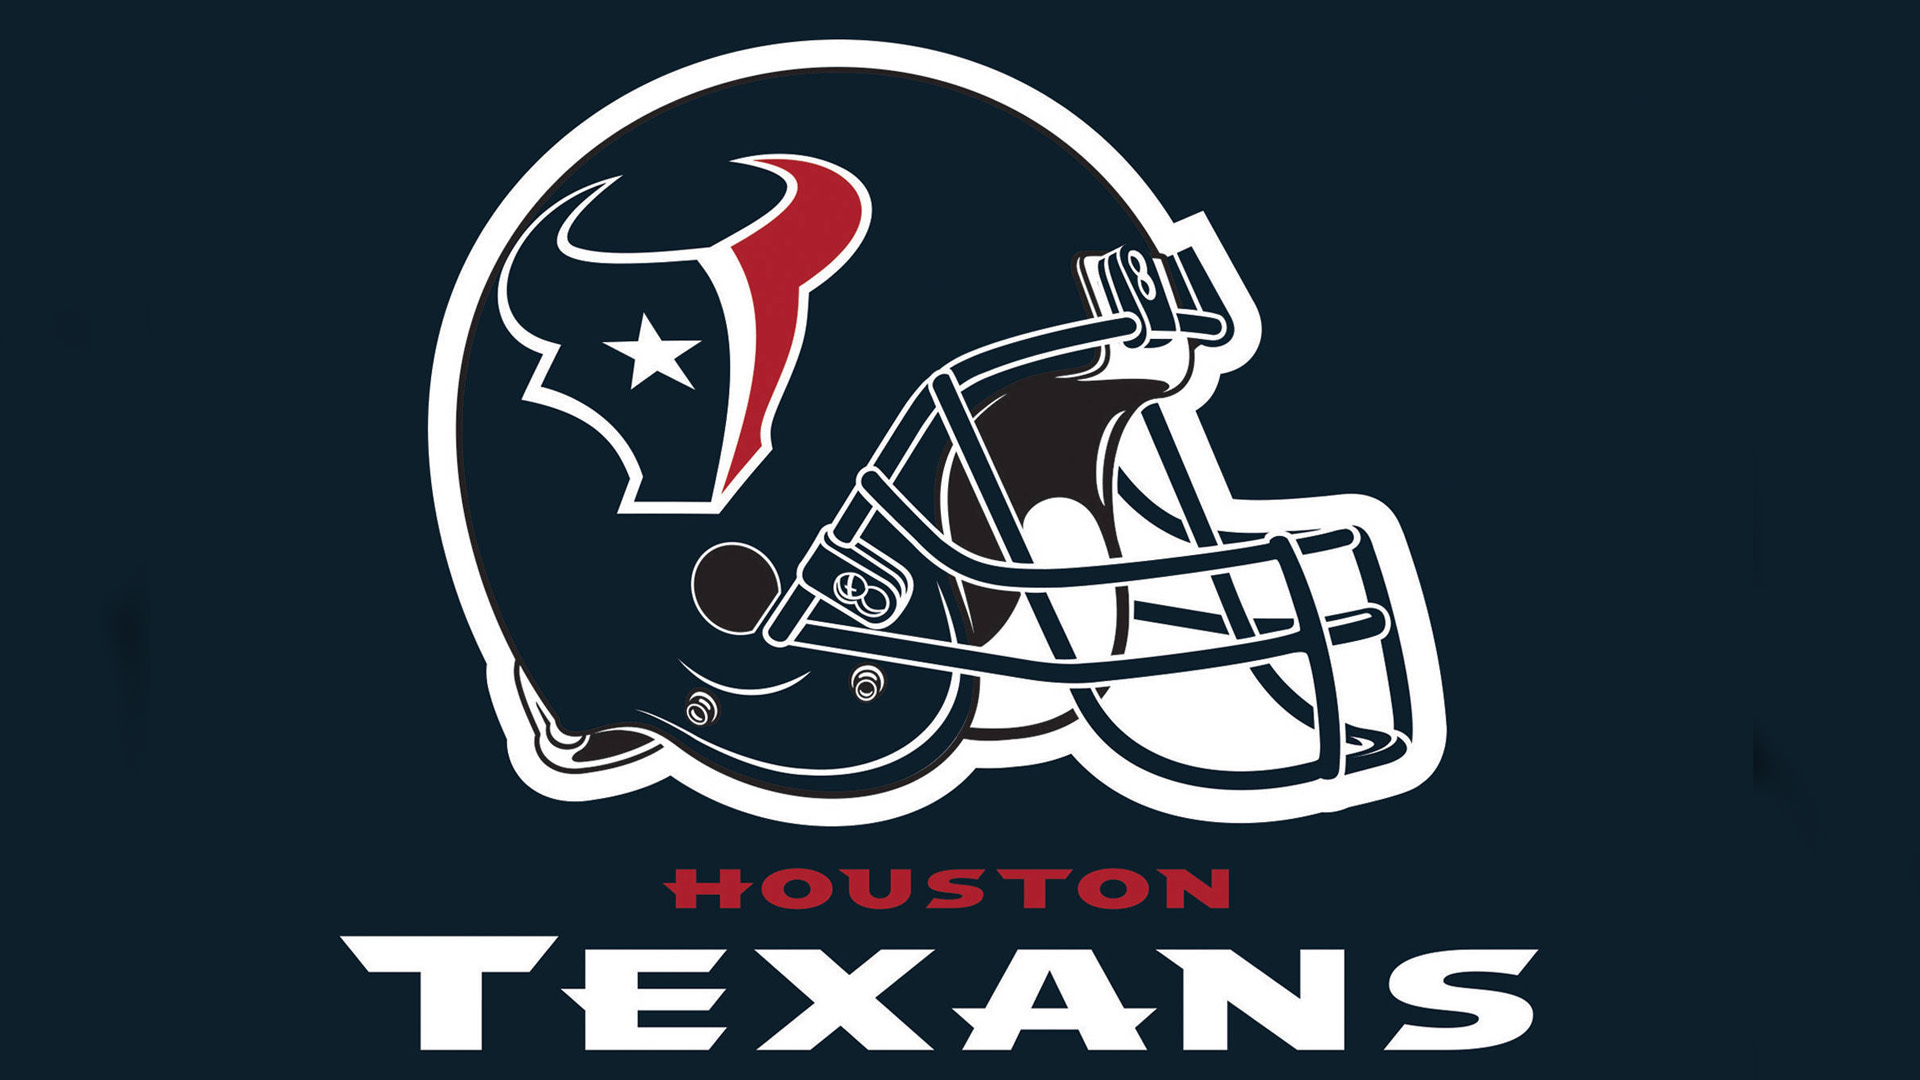 Houston Texans Wallpaper